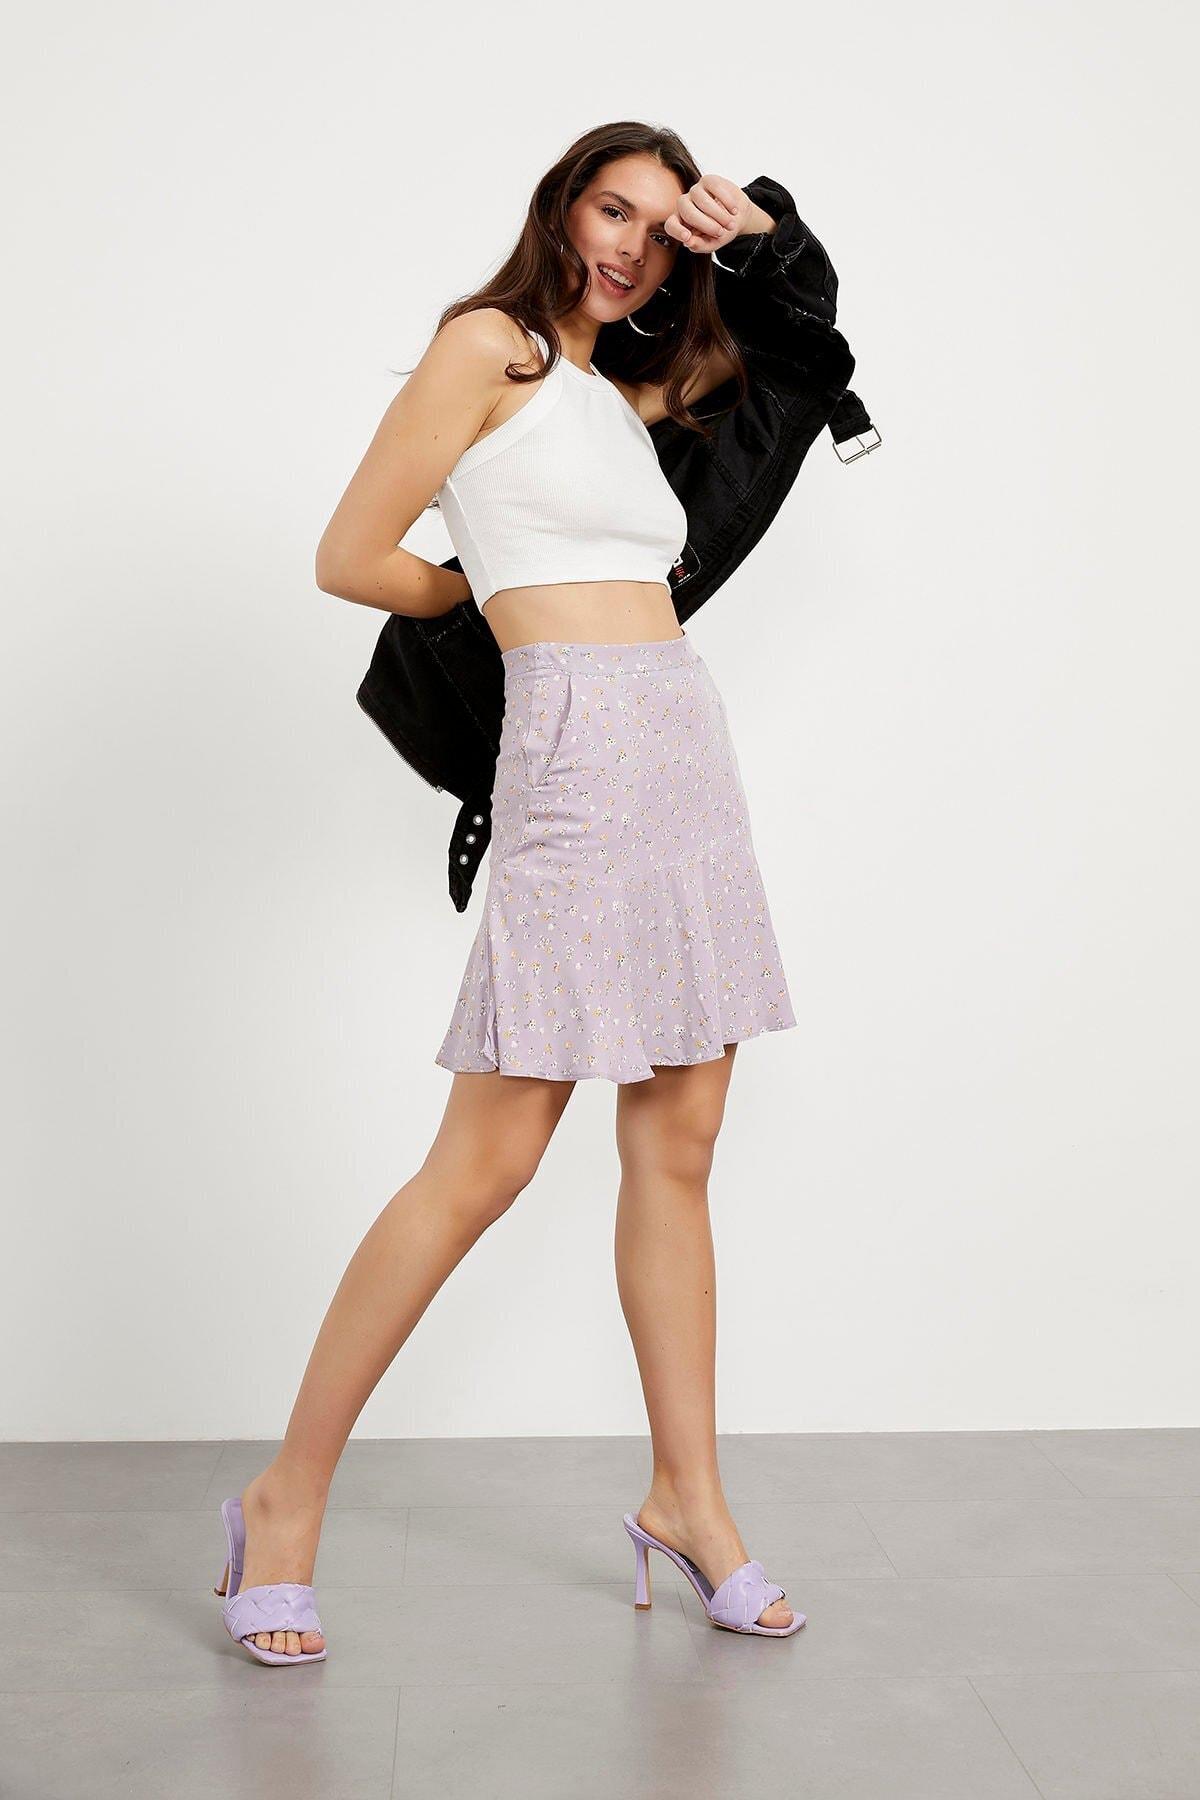 Flywheel Women Mini Skirts Women Skirt Fashion Casual Sport